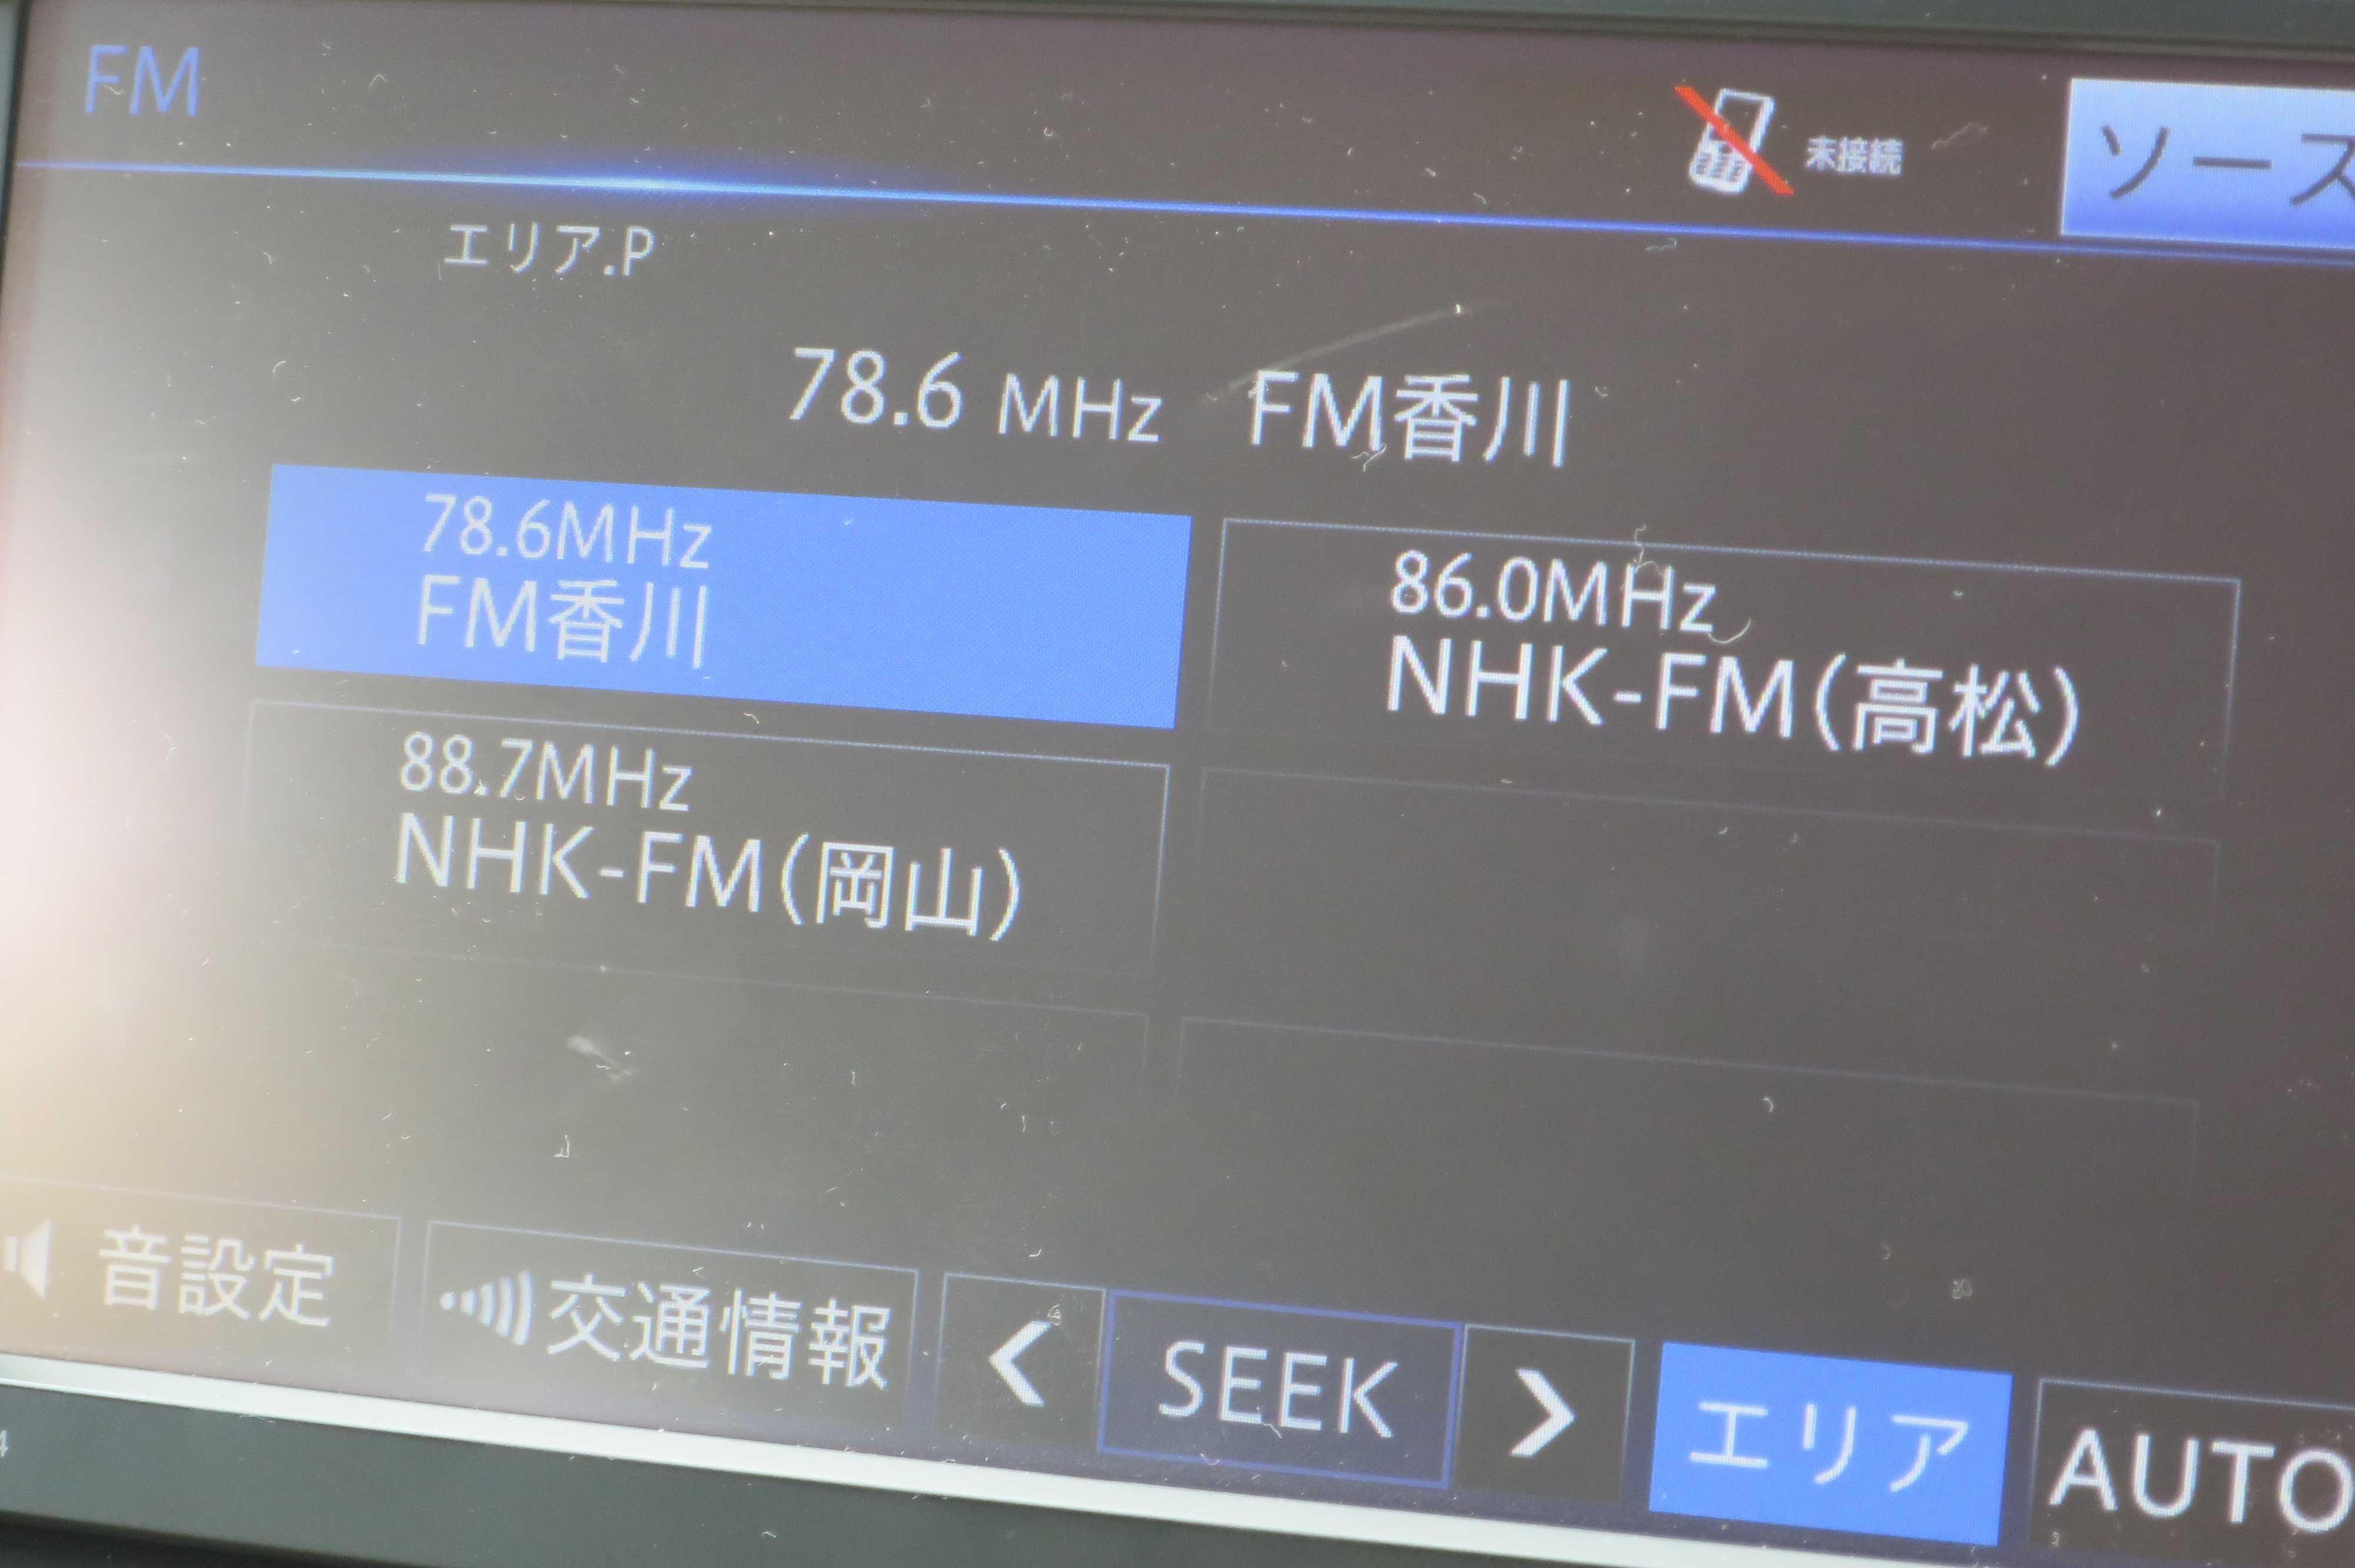 78.6MHz FM香川